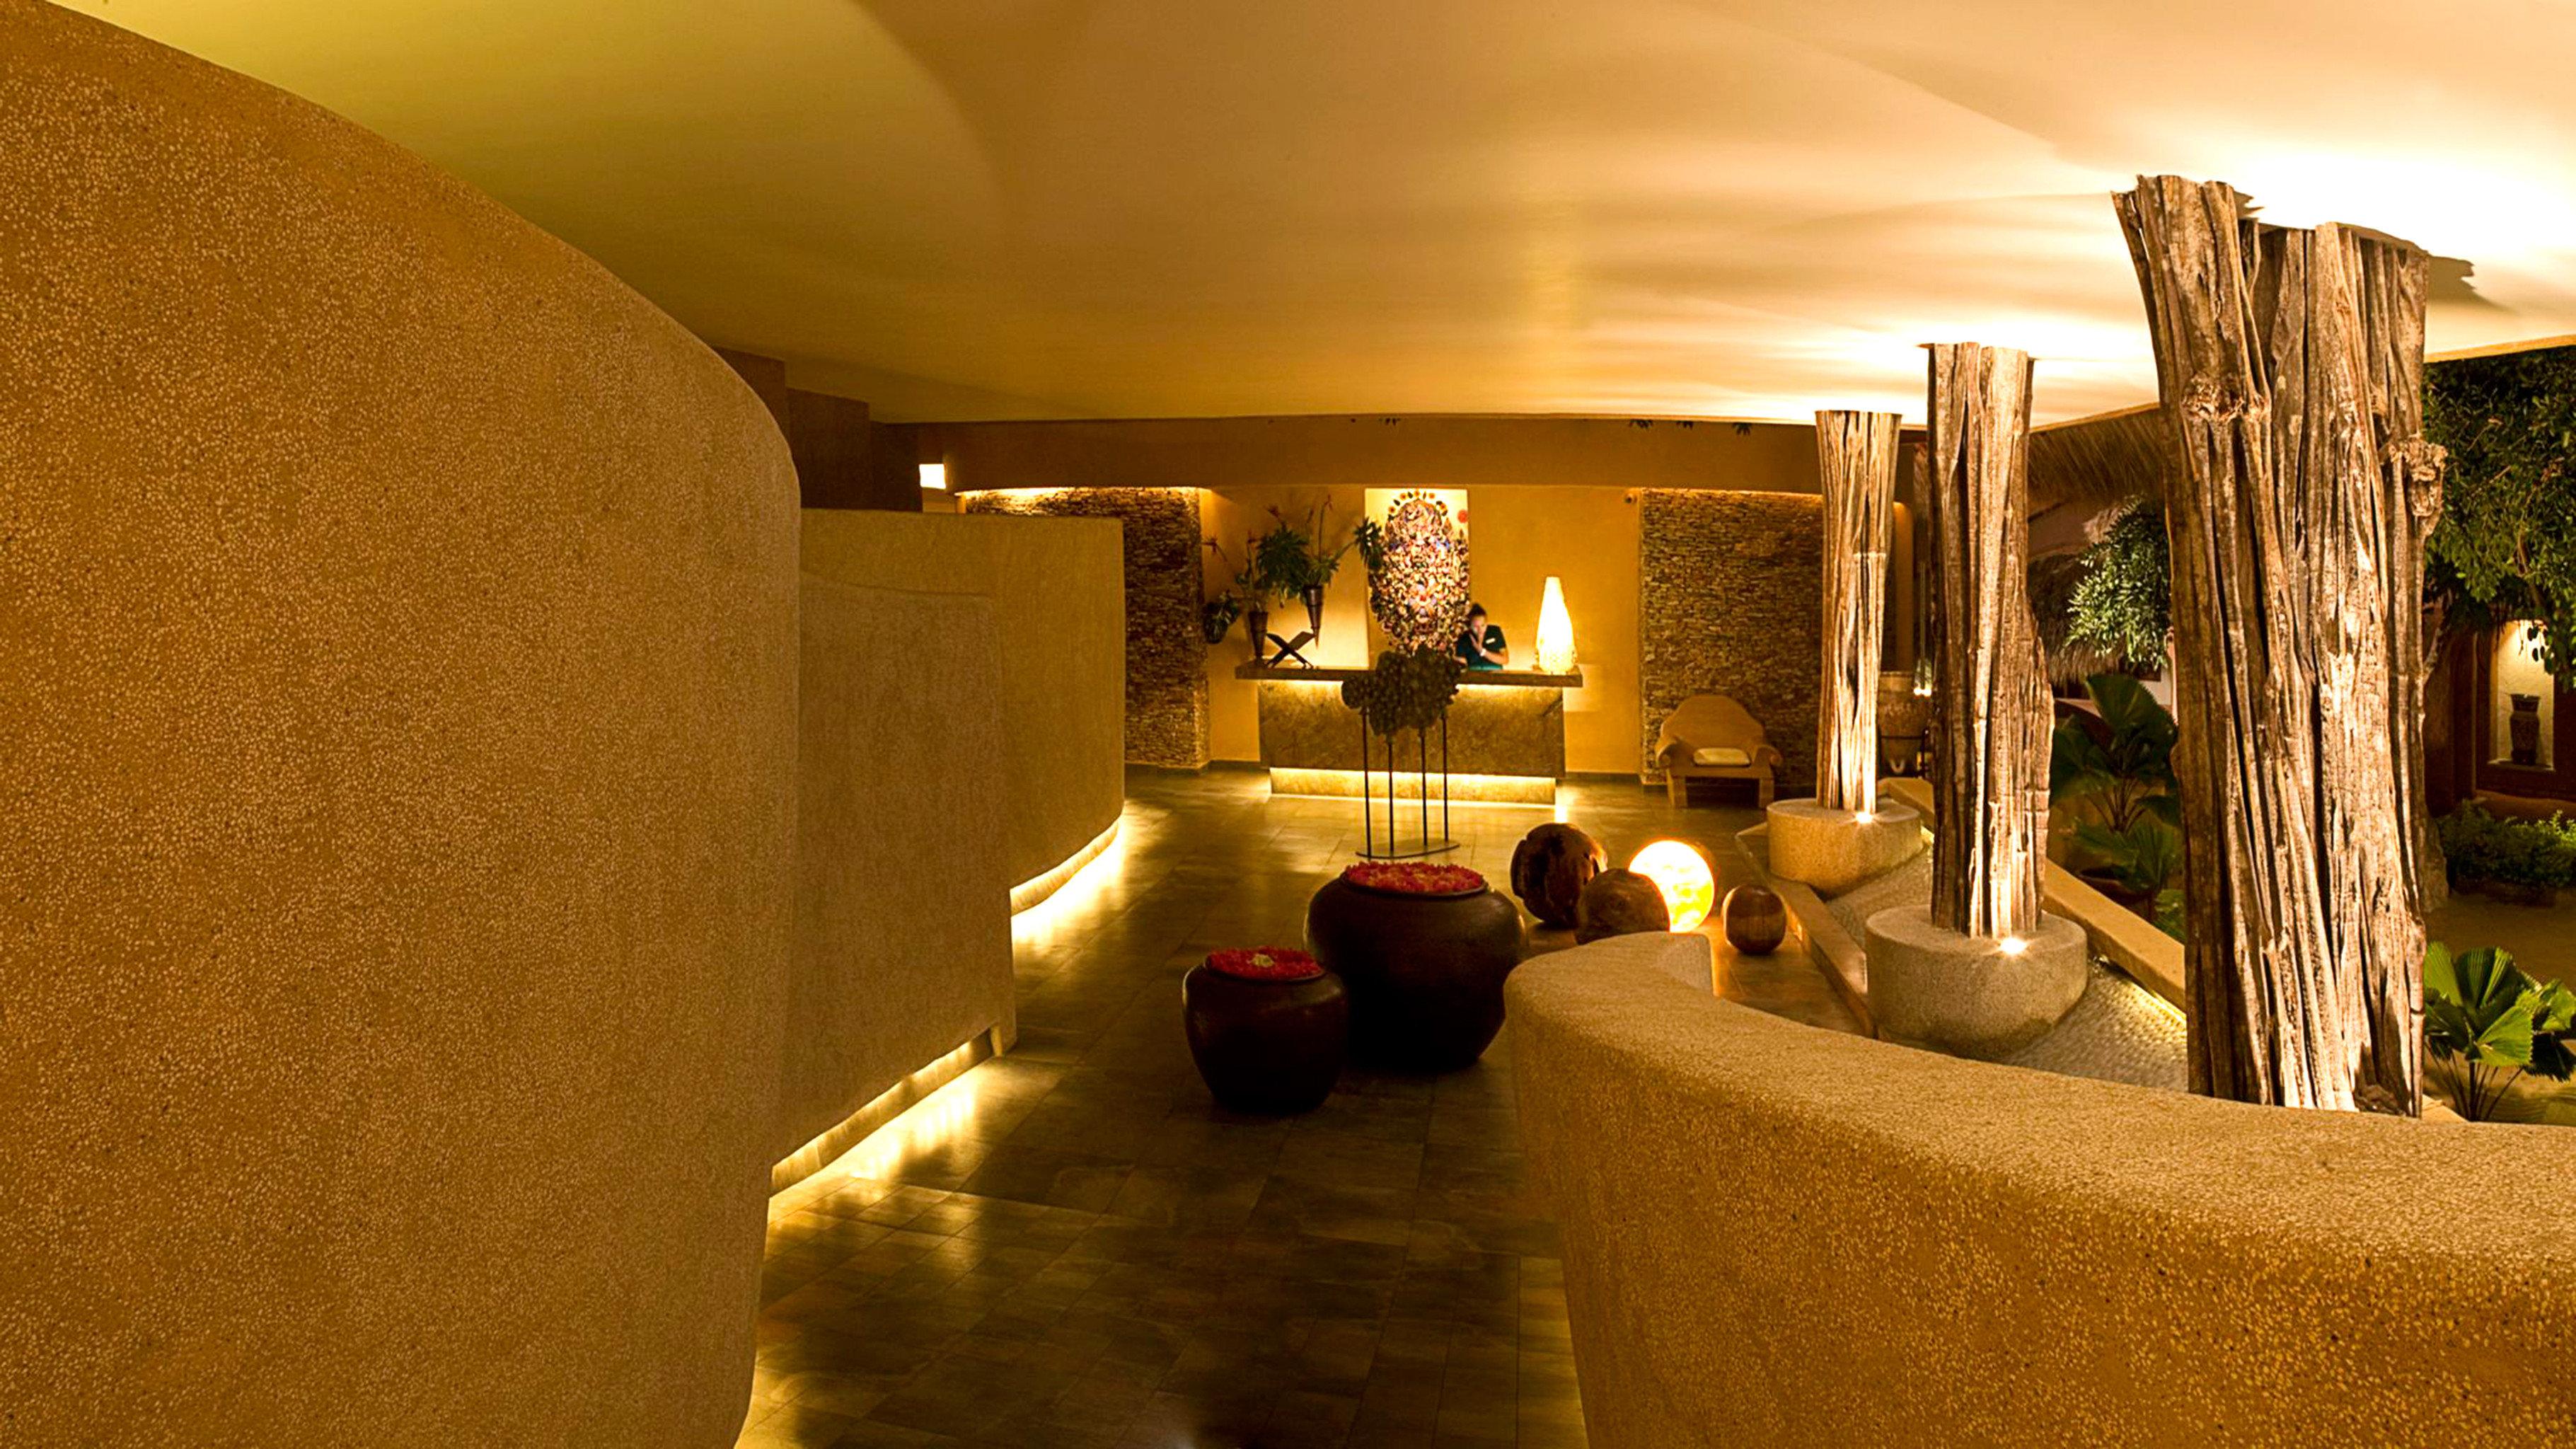 Lounge Luxury house home Lobby hacienda